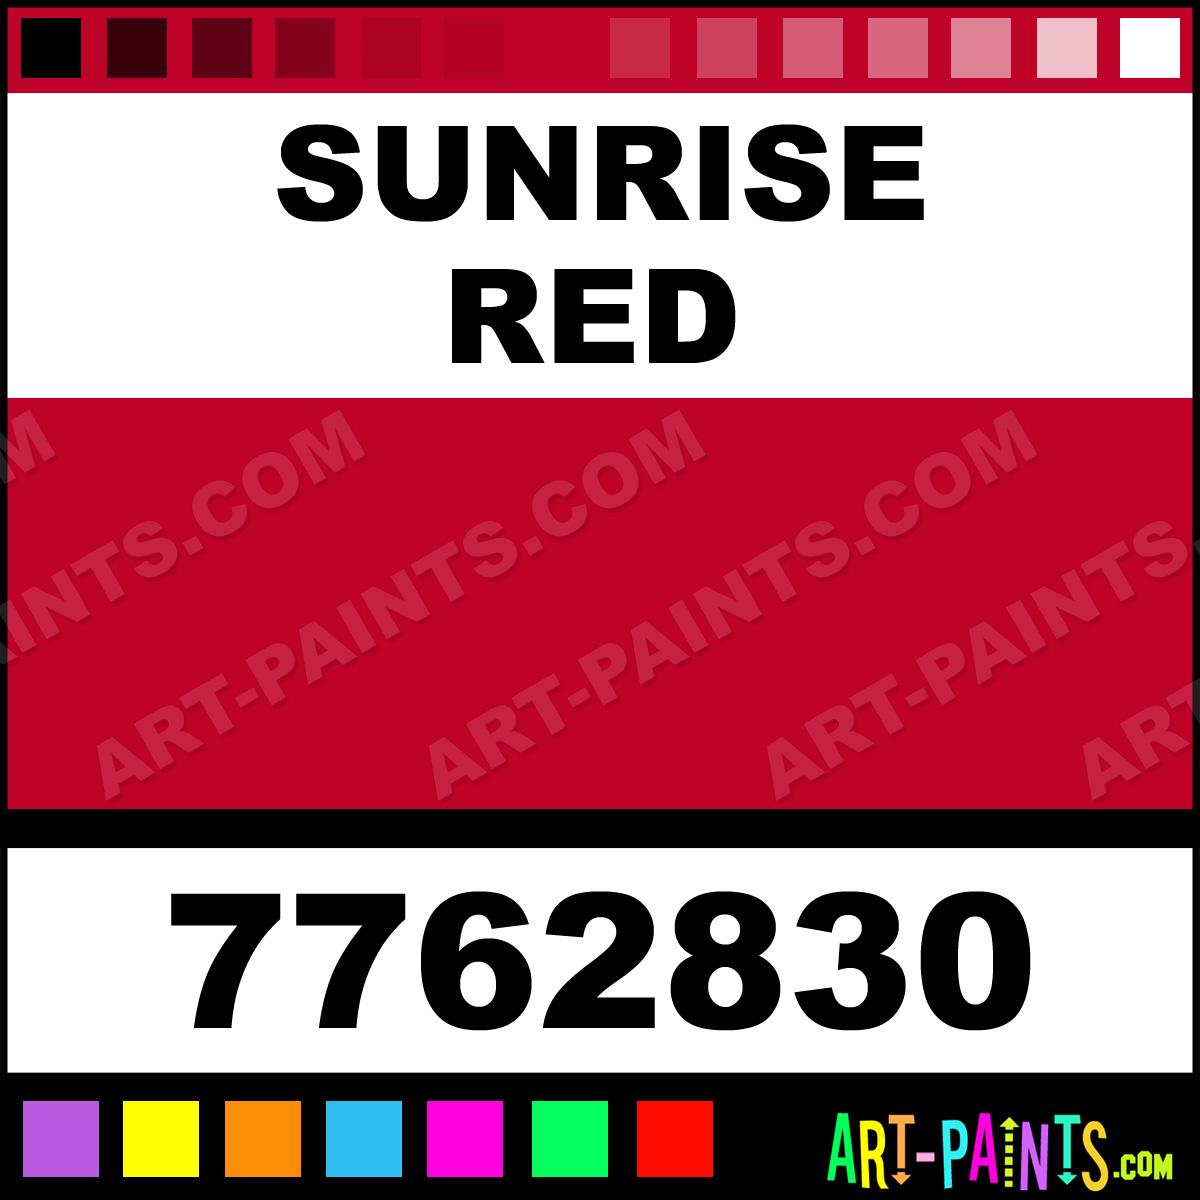 Sunrise Red Gloss Protective Enamel Paints 7762830